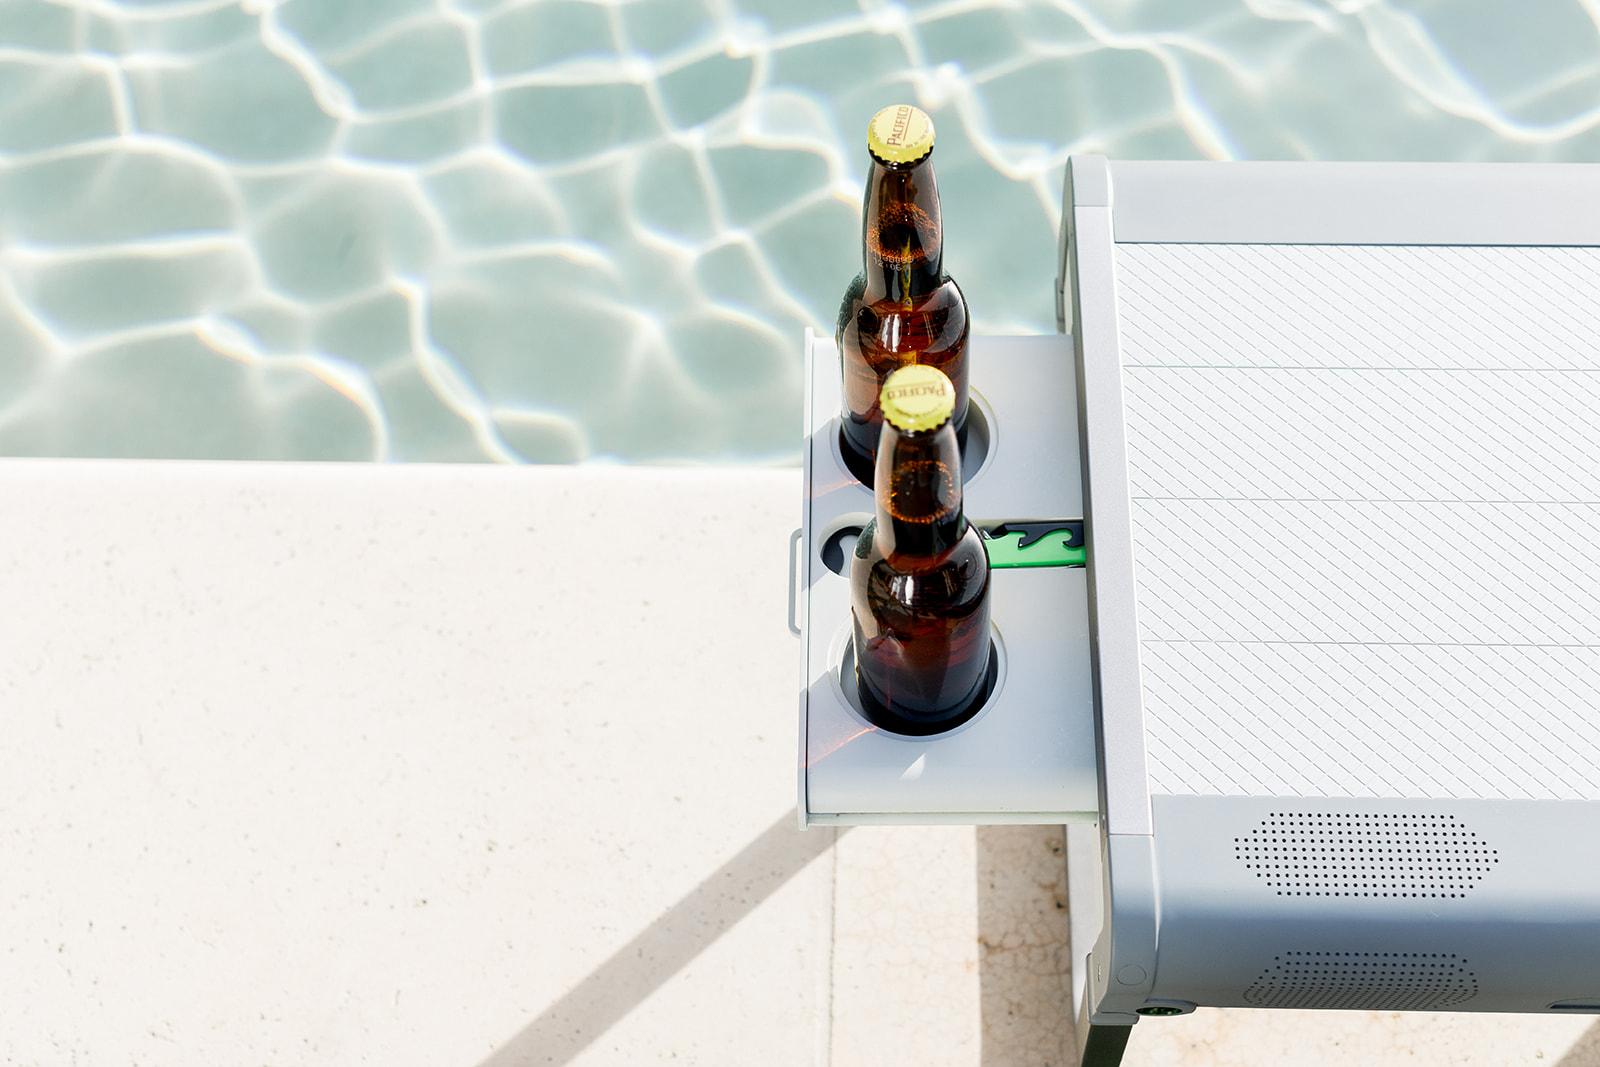 PorTable-Smart-Table-Product-Photos-17.jpg